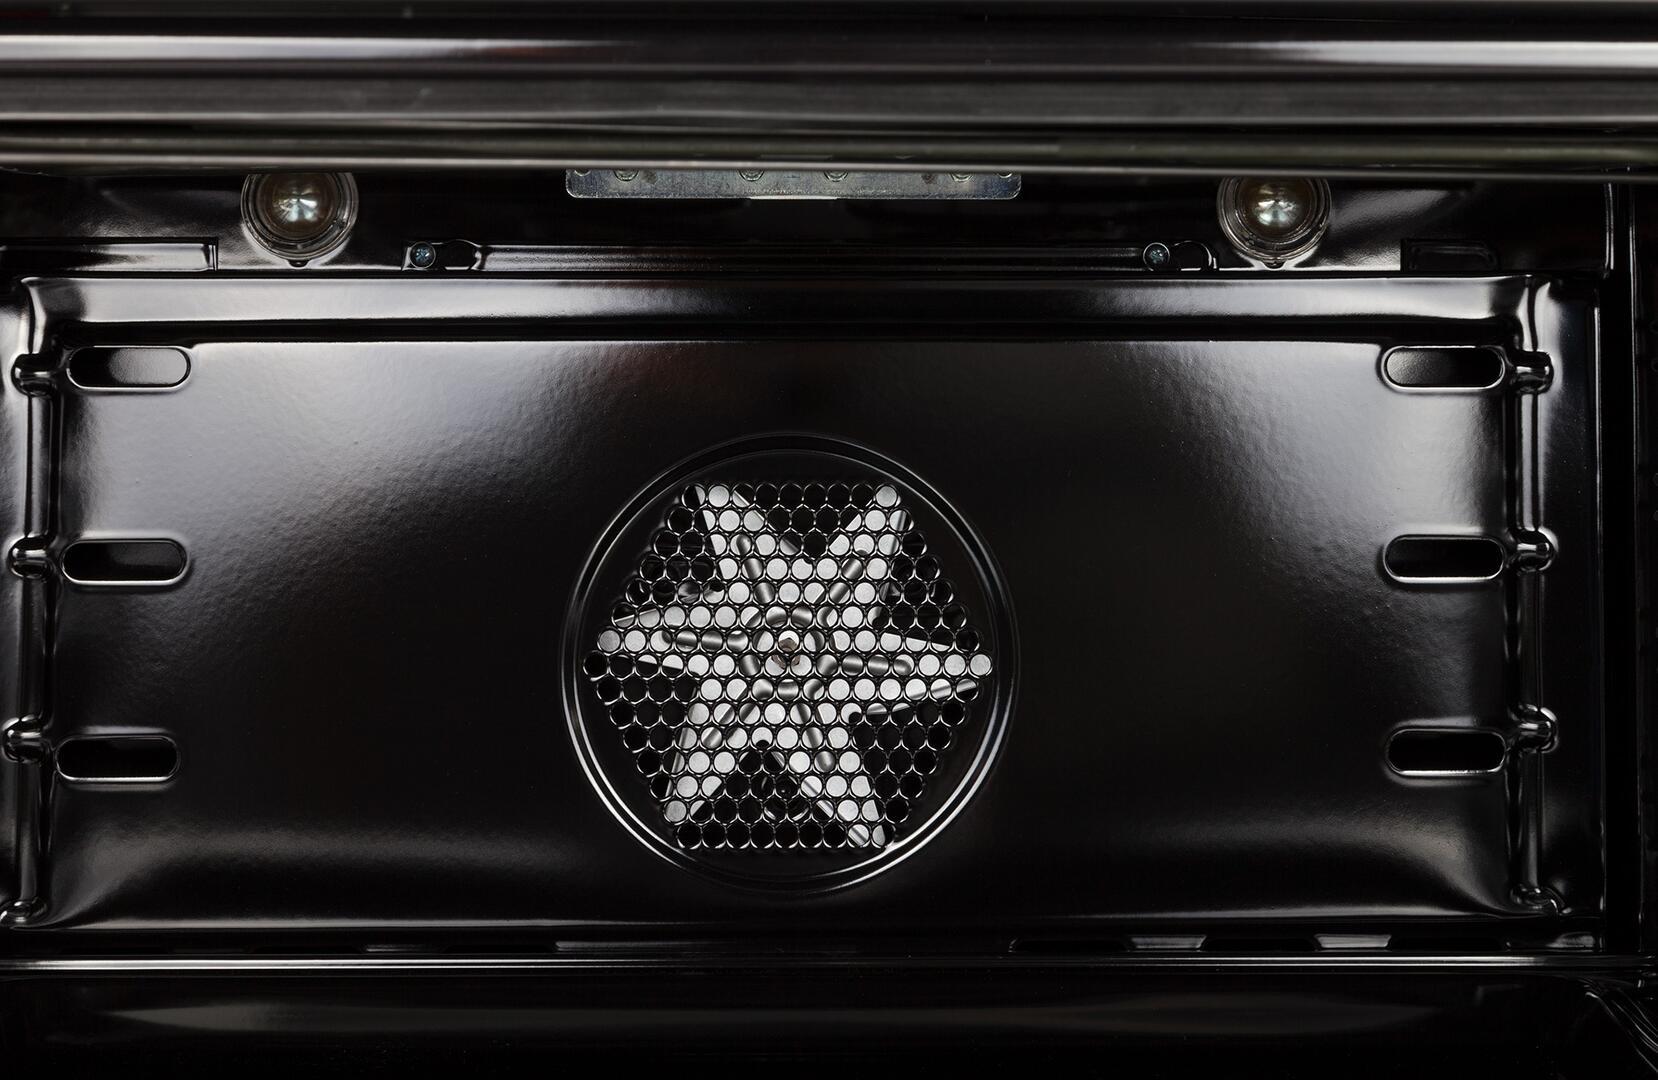 Ilve Nostalgie UPN120FDMPAY Freestanding Dual Fuel Range Bisque, Oven Interior